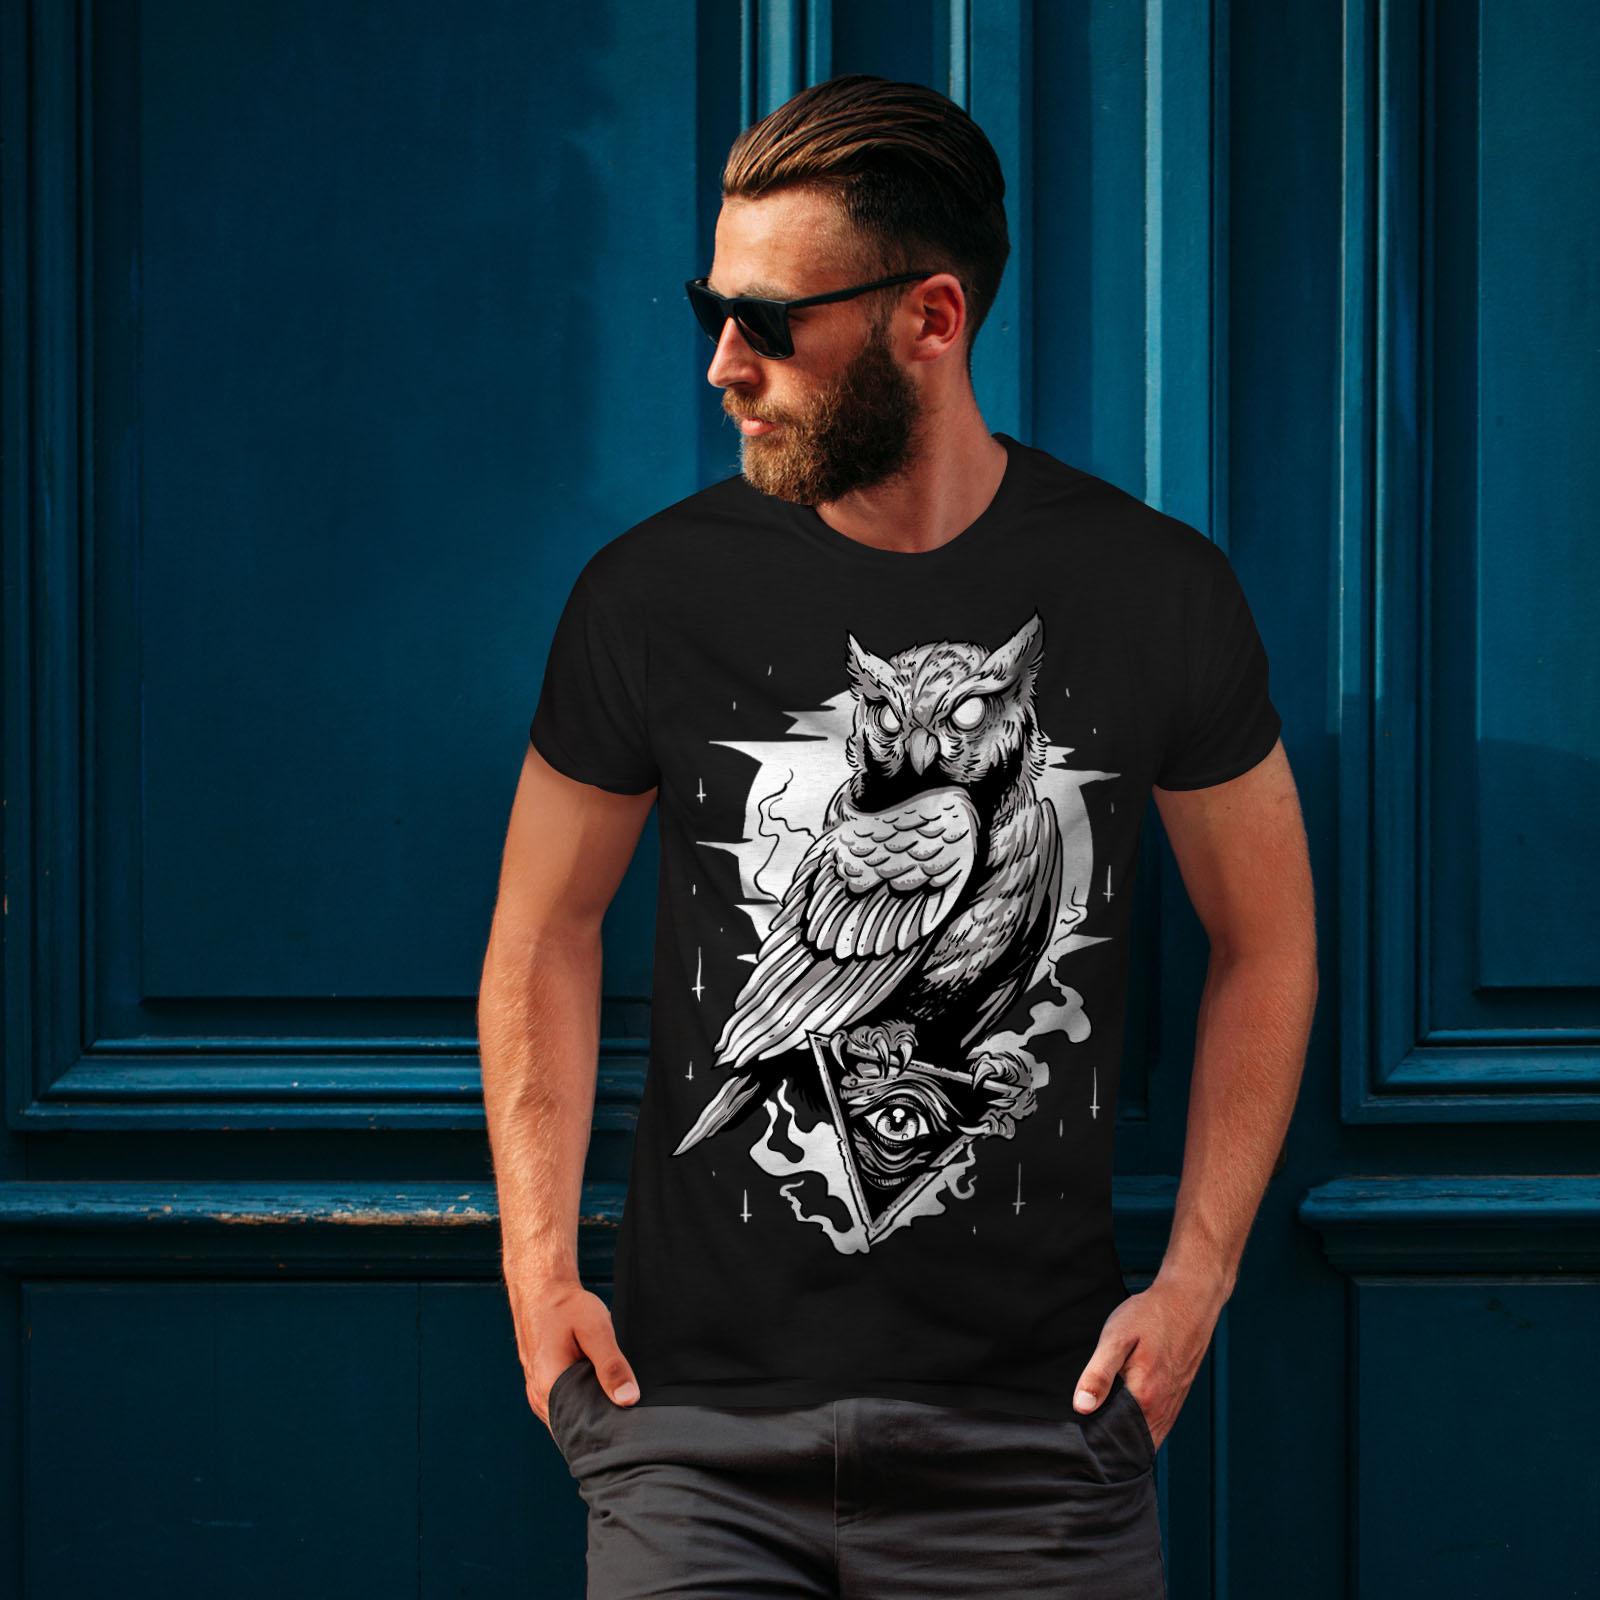 miniature 4 - Wellcoda Triangle Owl Mens T-shirt, Conspiracy Graphic Design Printed Tee